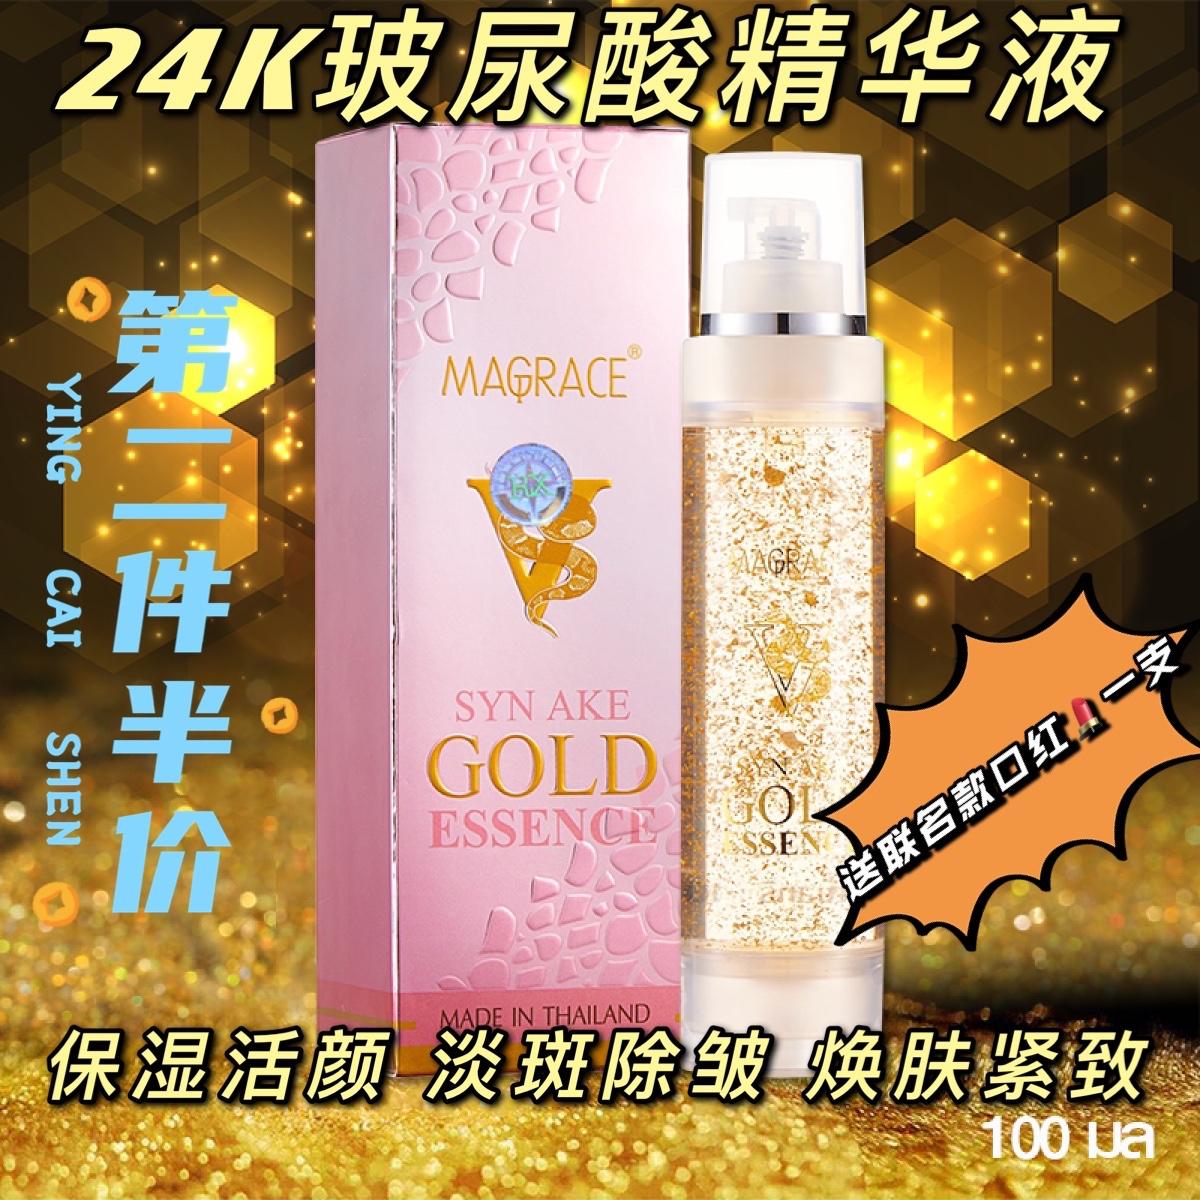 Thailand 24K gold essence anti wrinkle facial tightening essence, hyaluronic acid, nicotinamide, moisturizing, moisturizing, moisturizing and moisturizing.